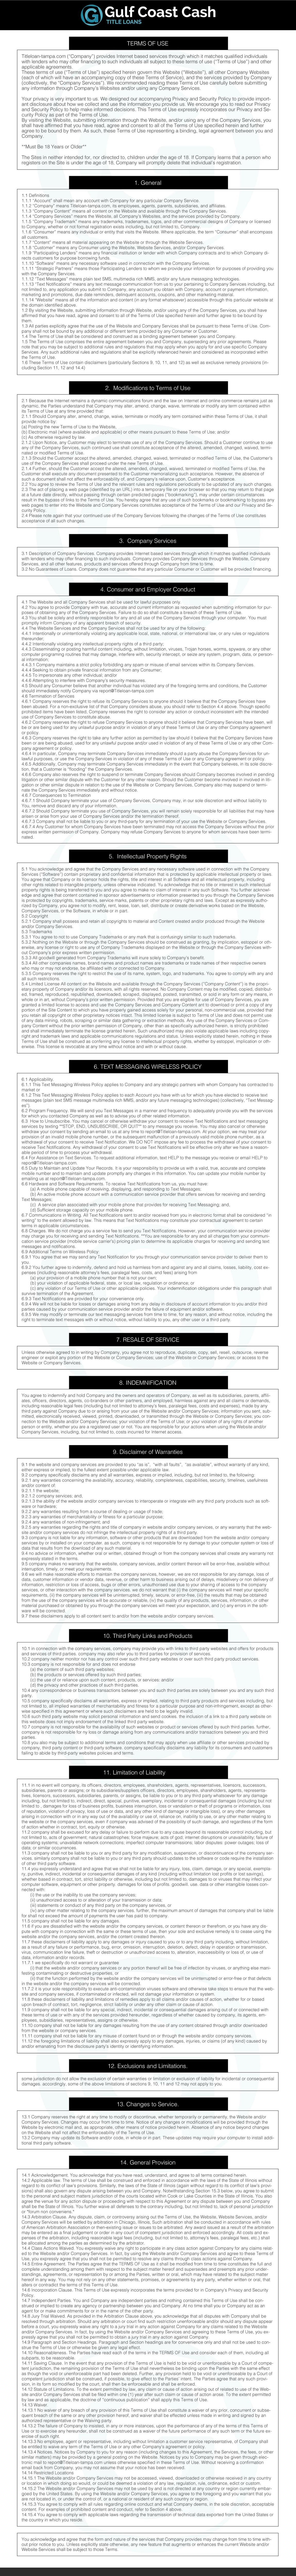 Cash Loan Agreement printable christmas gift certificates – Cash Loan Agreement